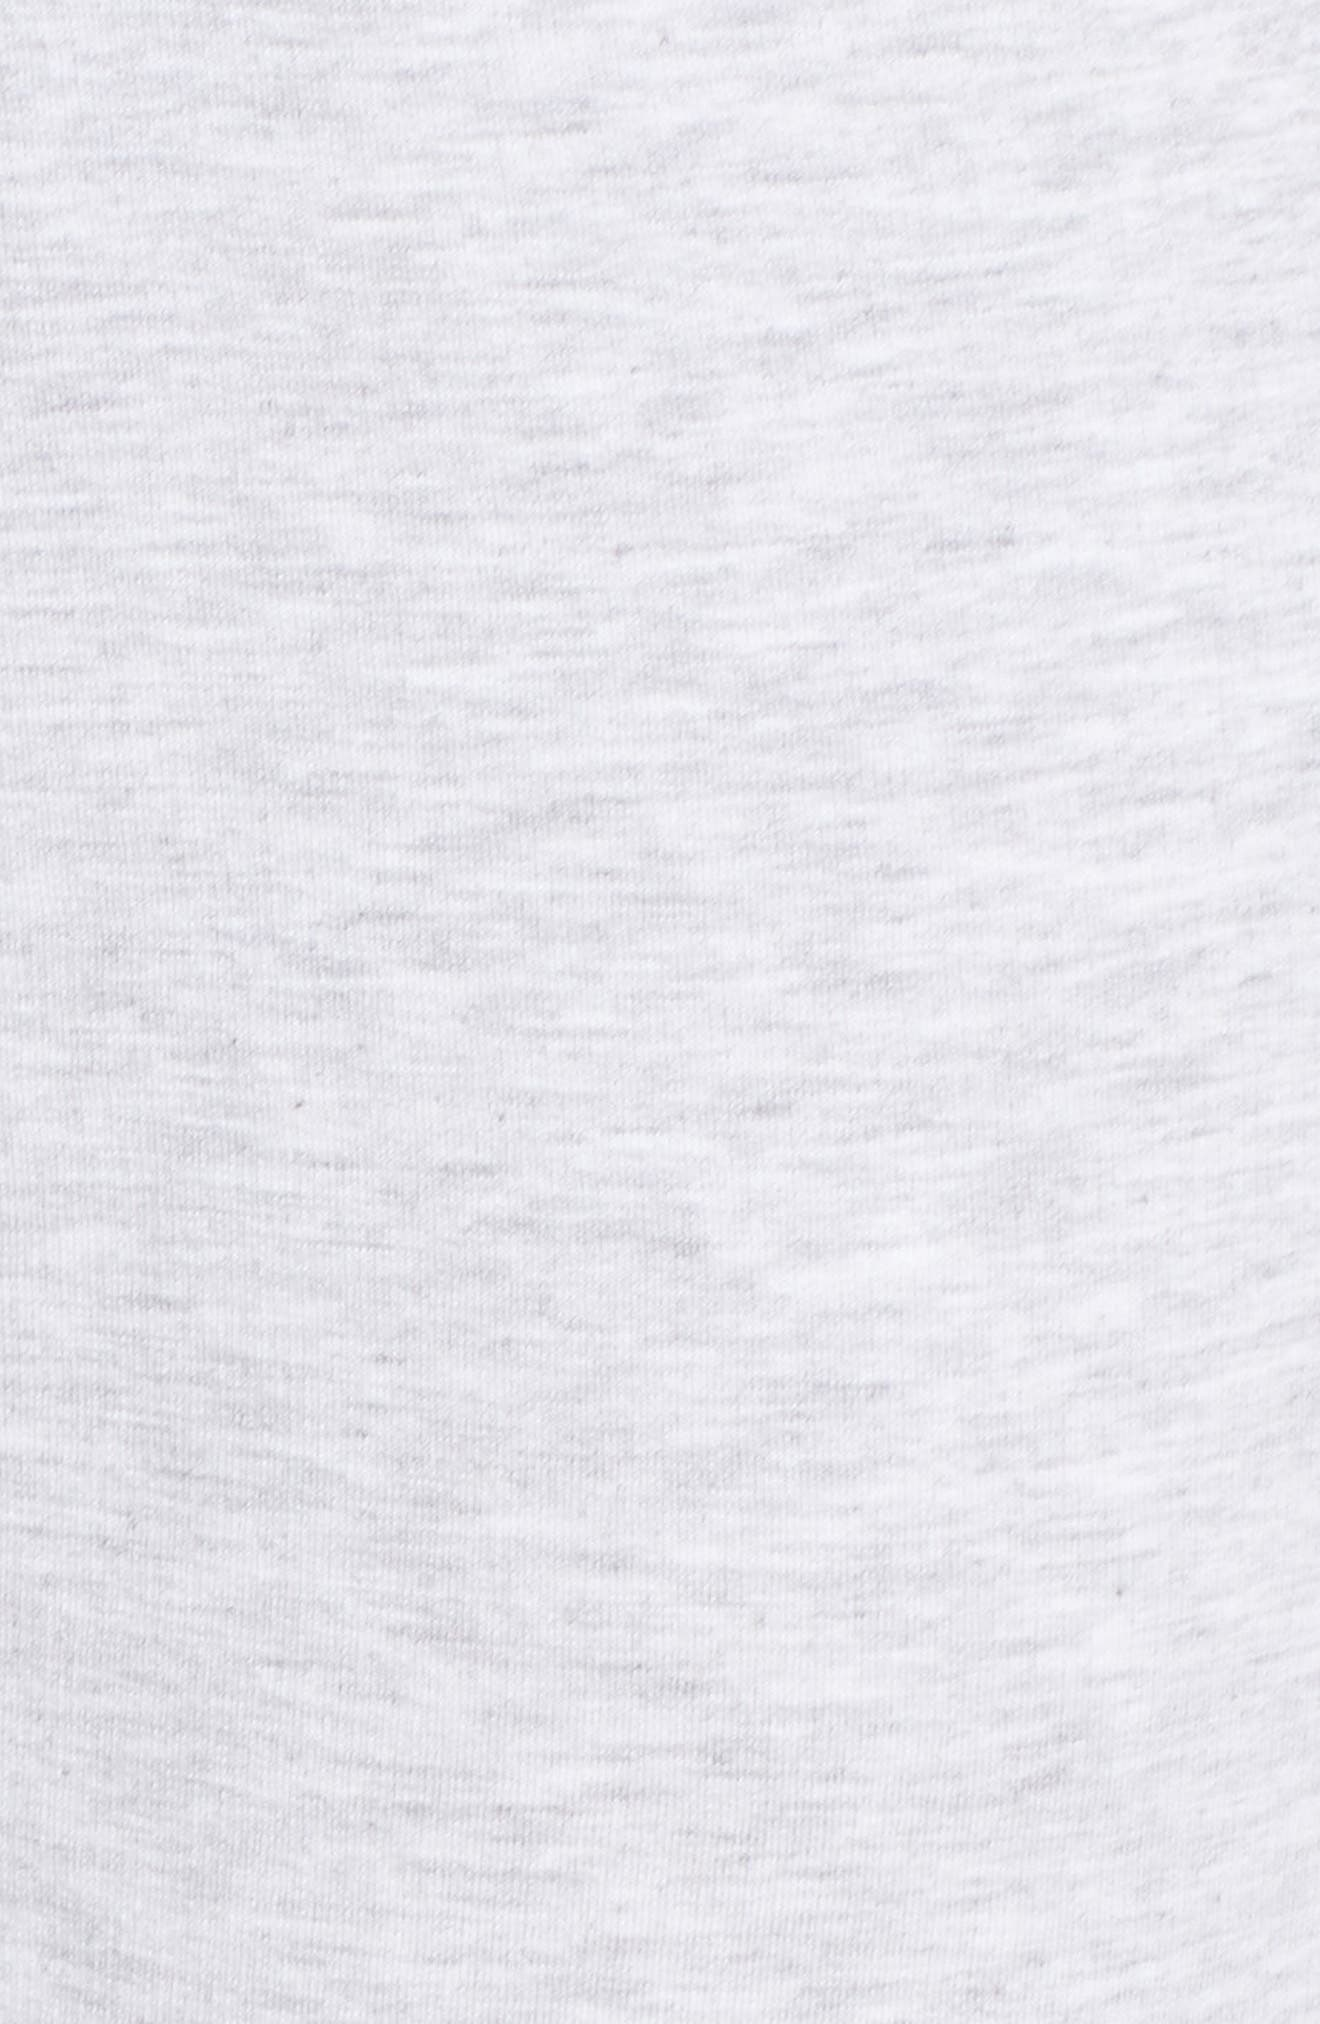 Jogger Pajama Pants,                             Alternate thumbnail 5, color,                             020